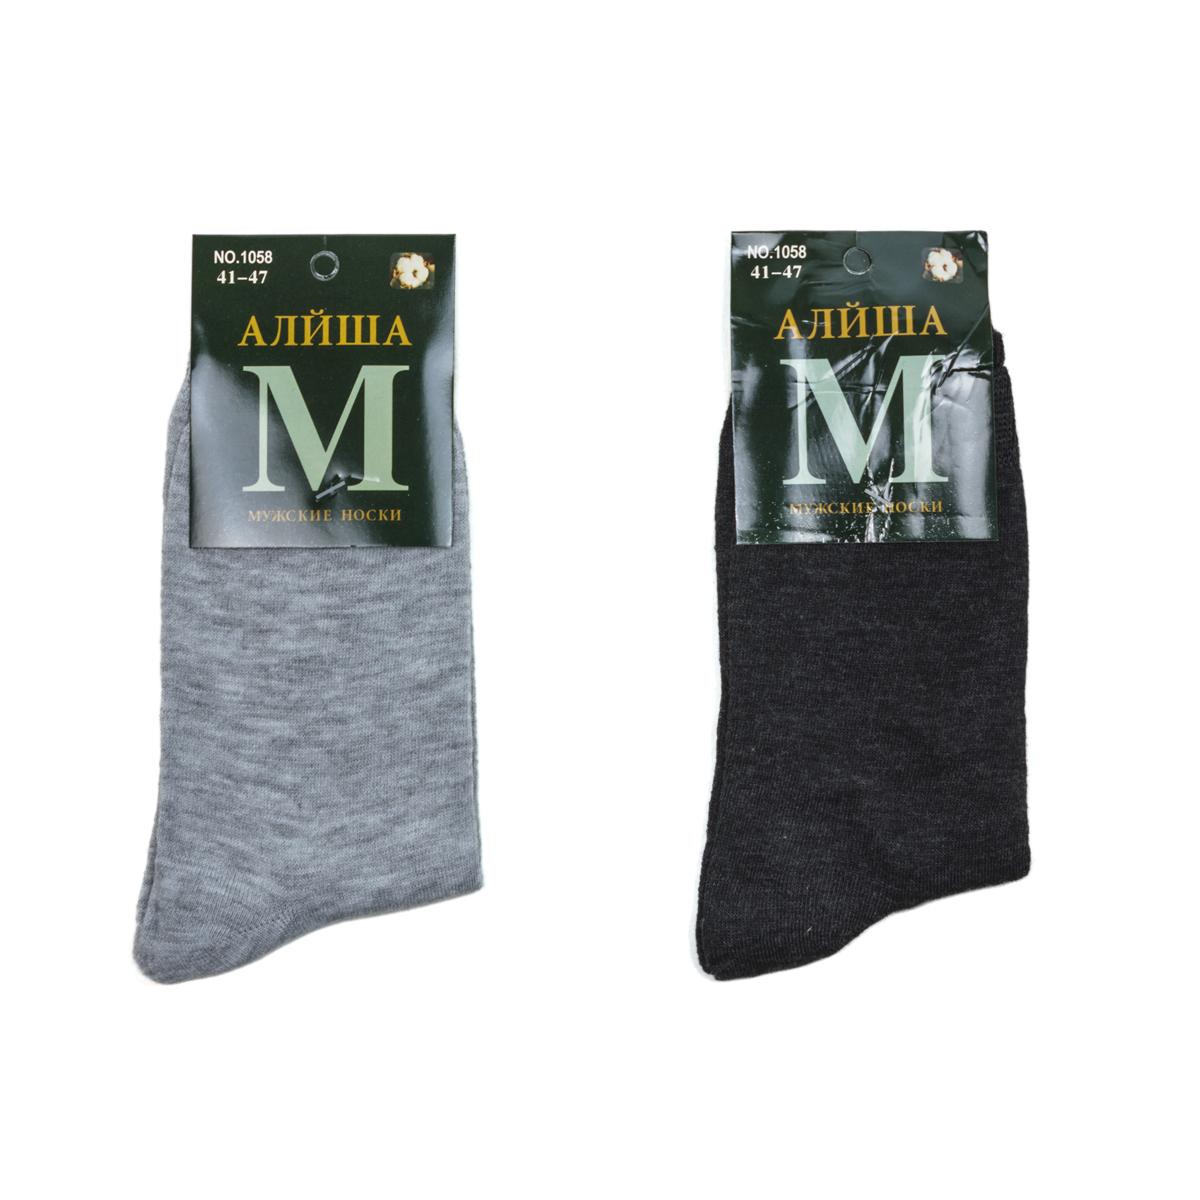 Муж. носки арт. 12-0025 Серый р. 41-47